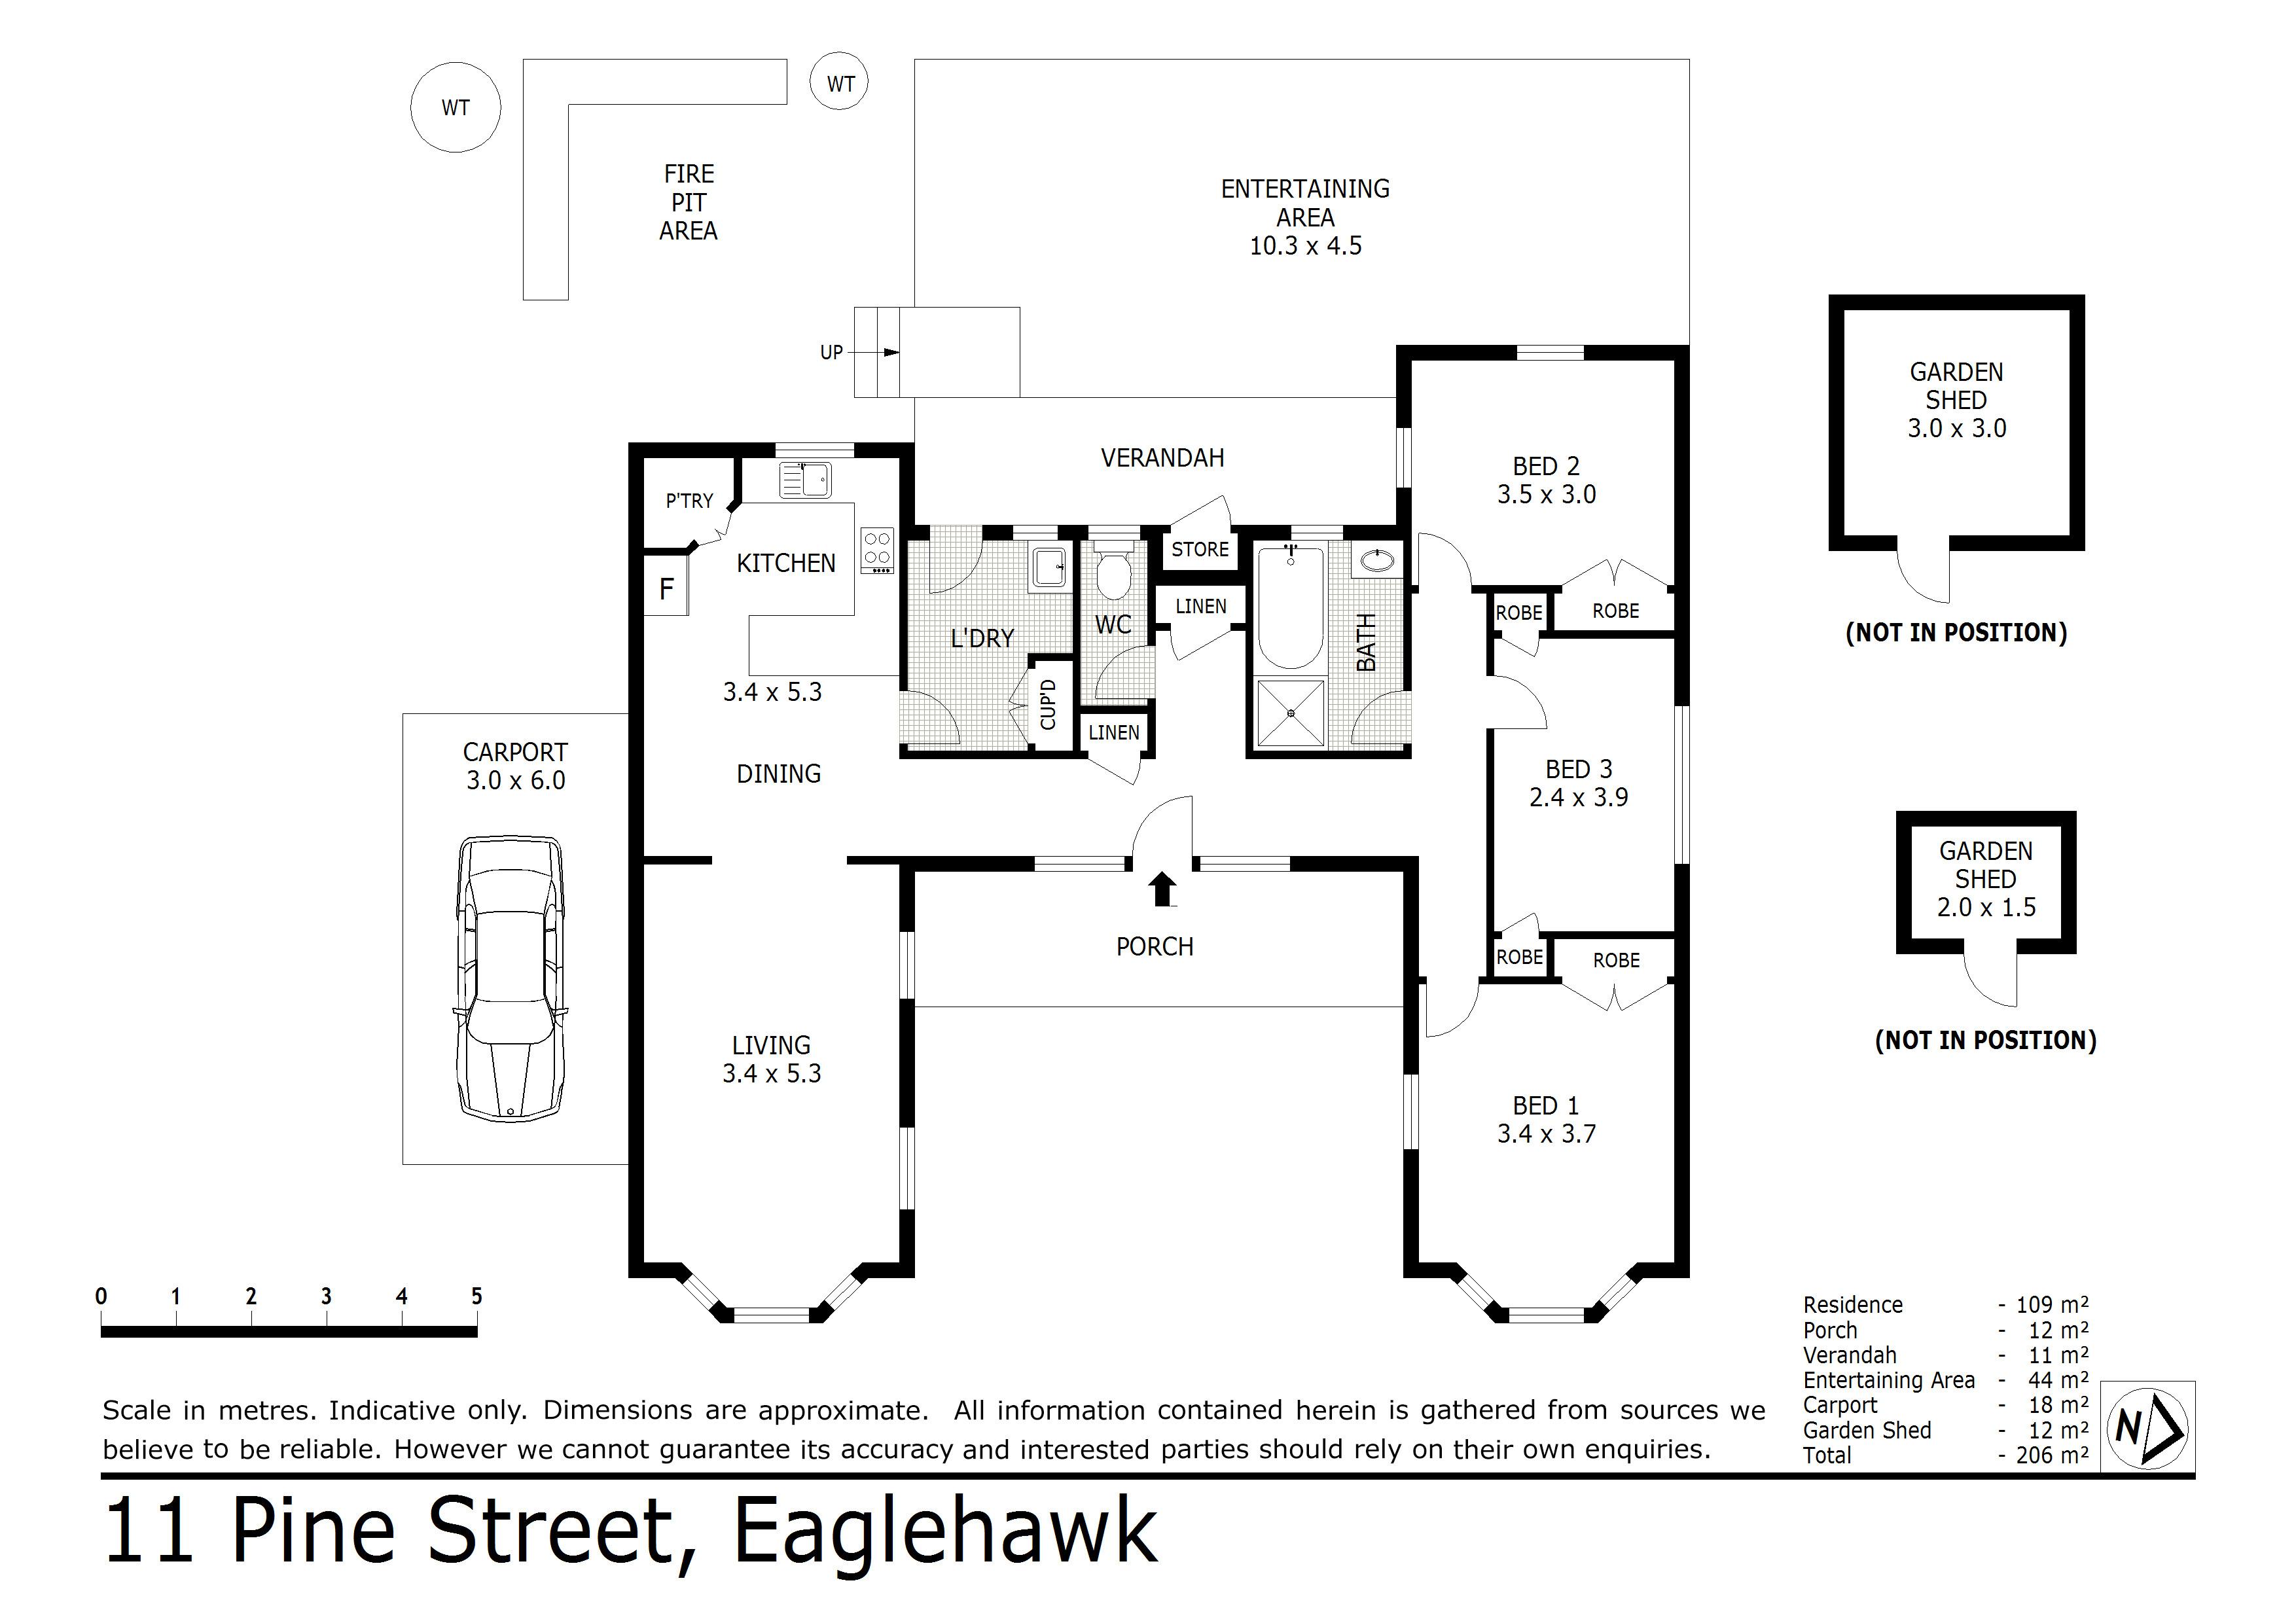 11 Pine Street, Eaglehawk, VIC 3556